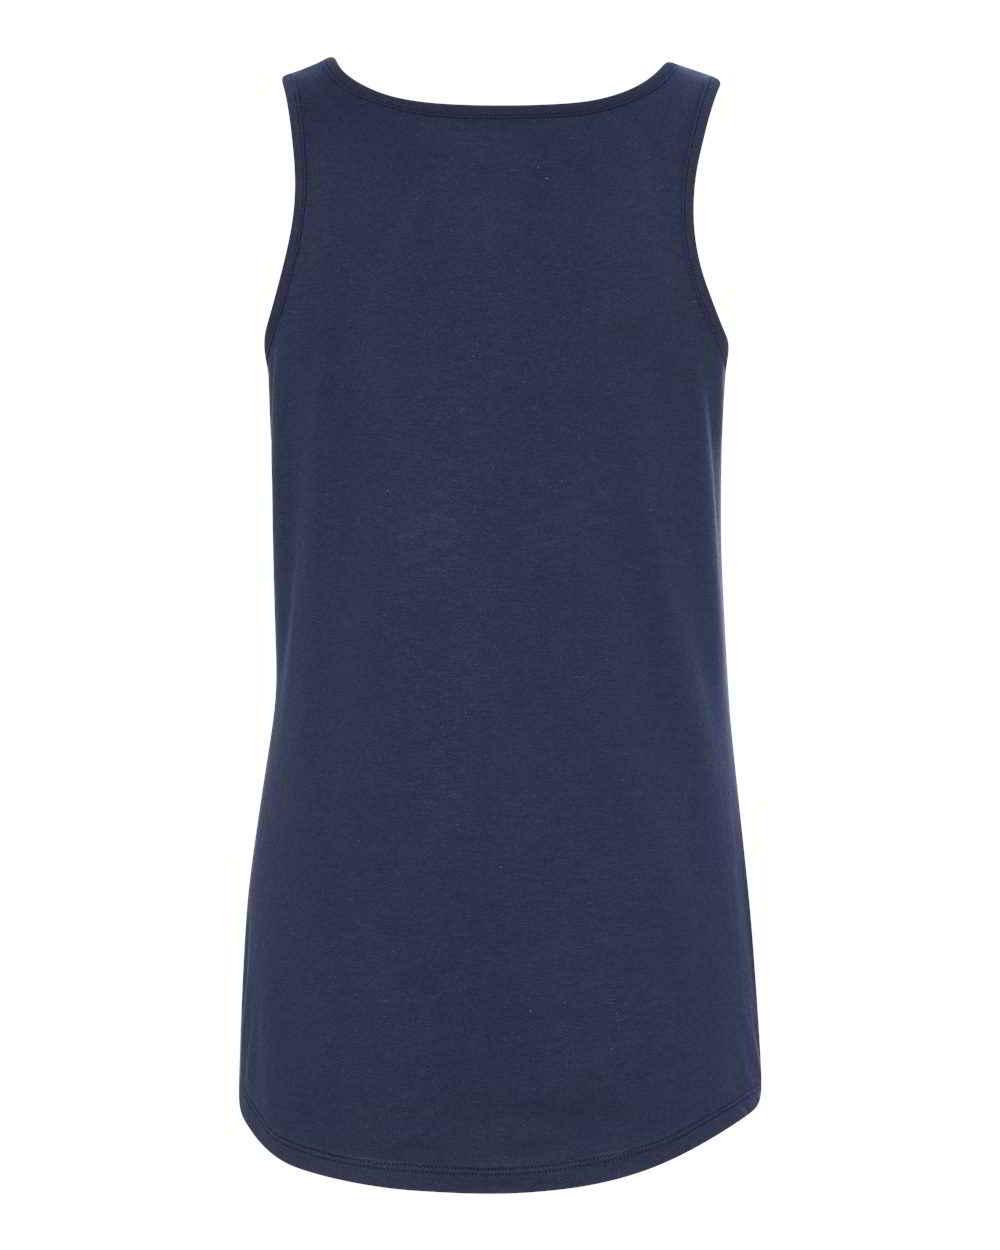 Hanes-Ladies-Moisture-Wicking-Shirts-Sleeveless-X-Temp-Women-039-s-Tank-Top thumbnail 15